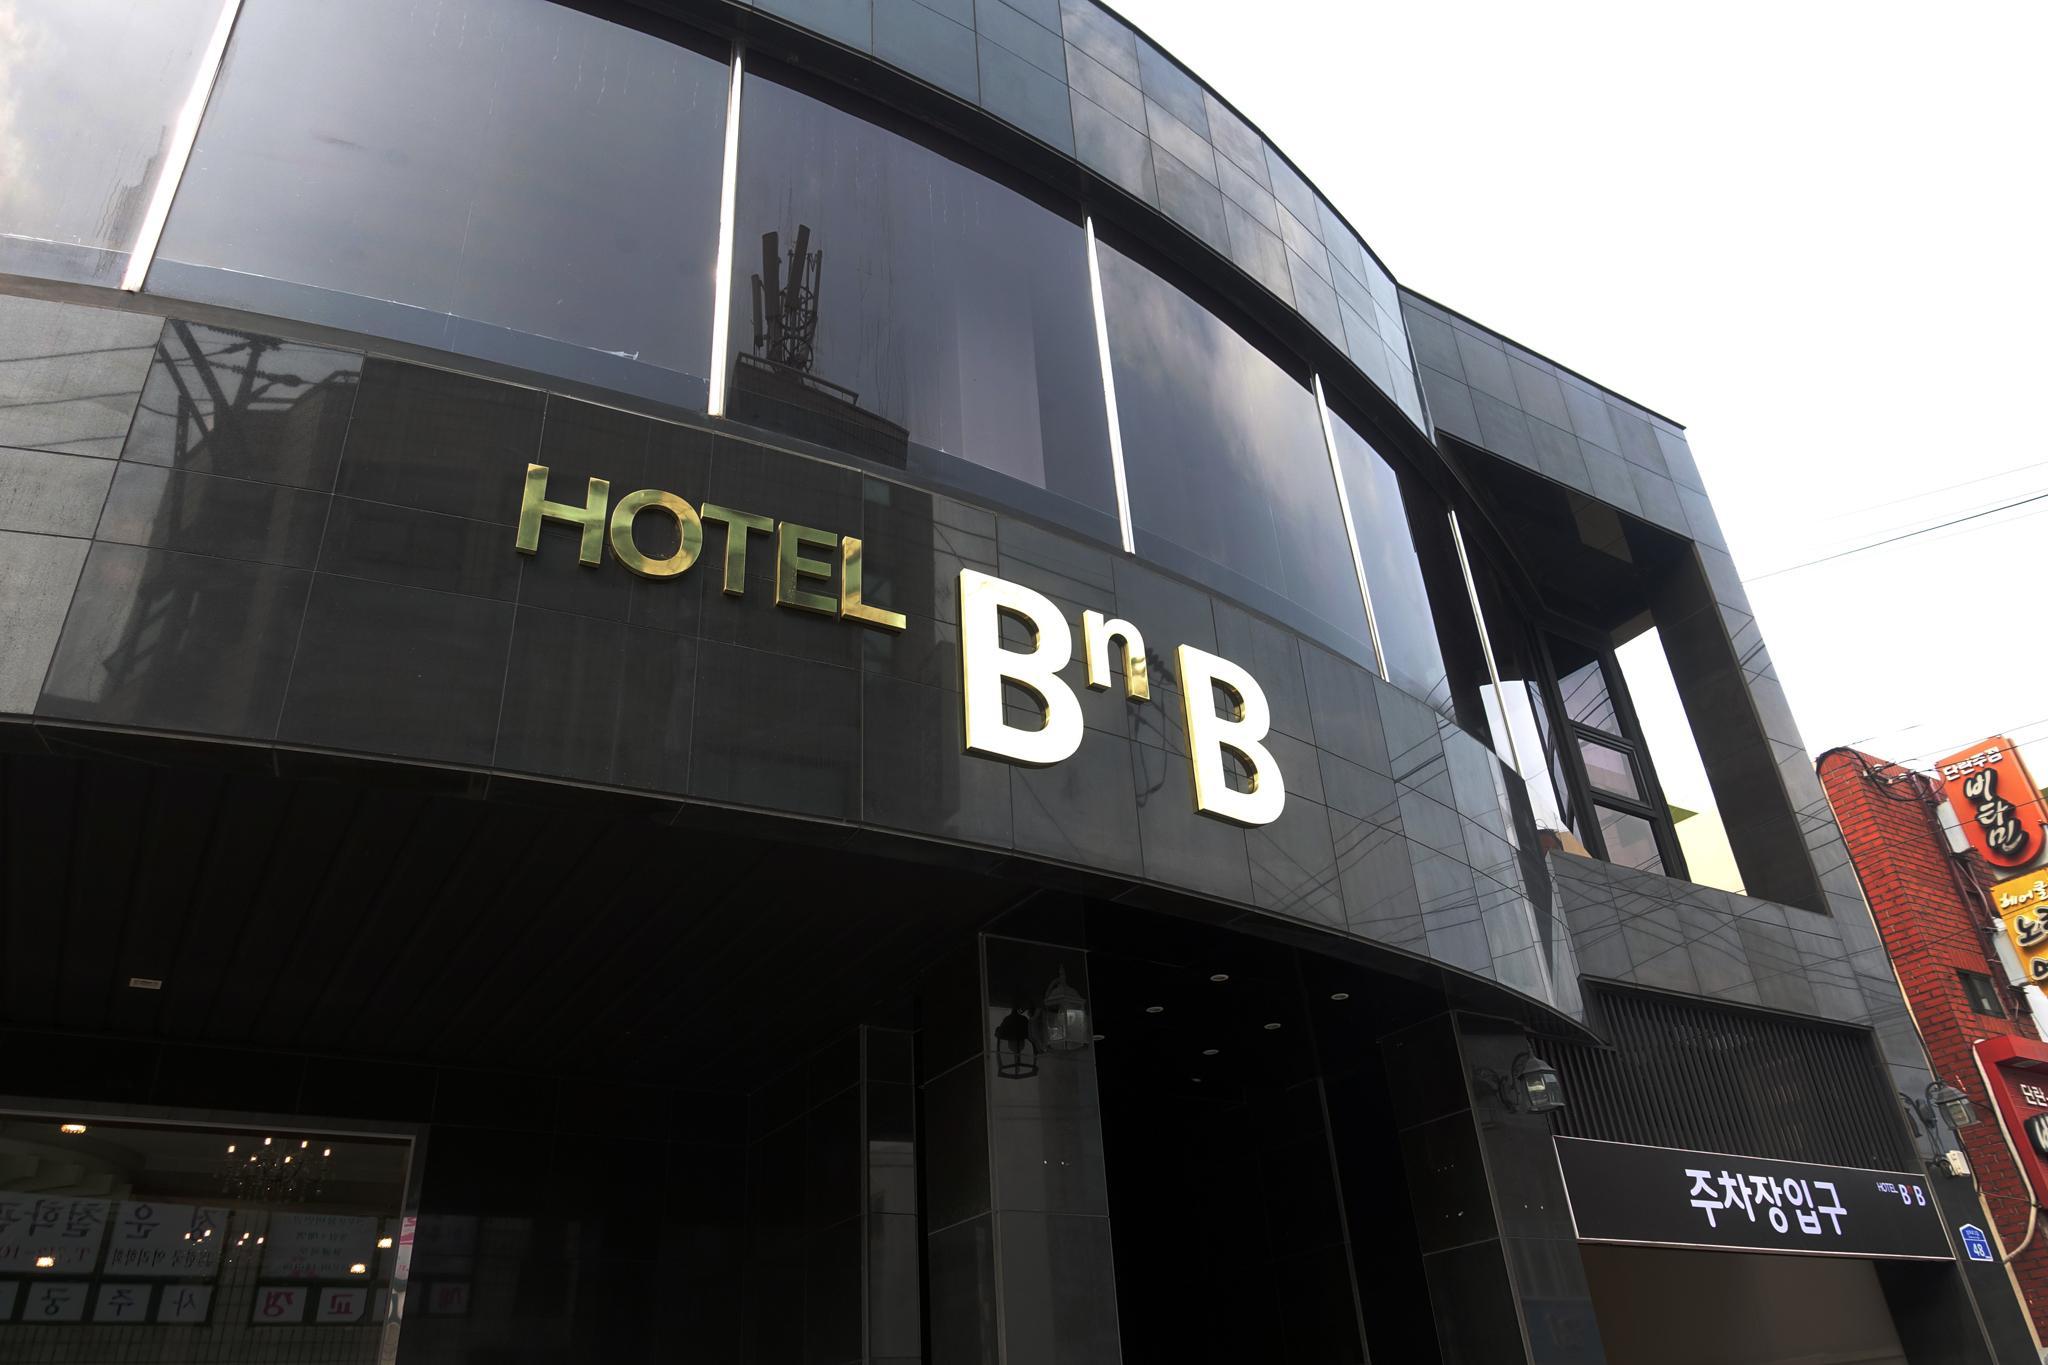 Gallery Hotel BnB 4